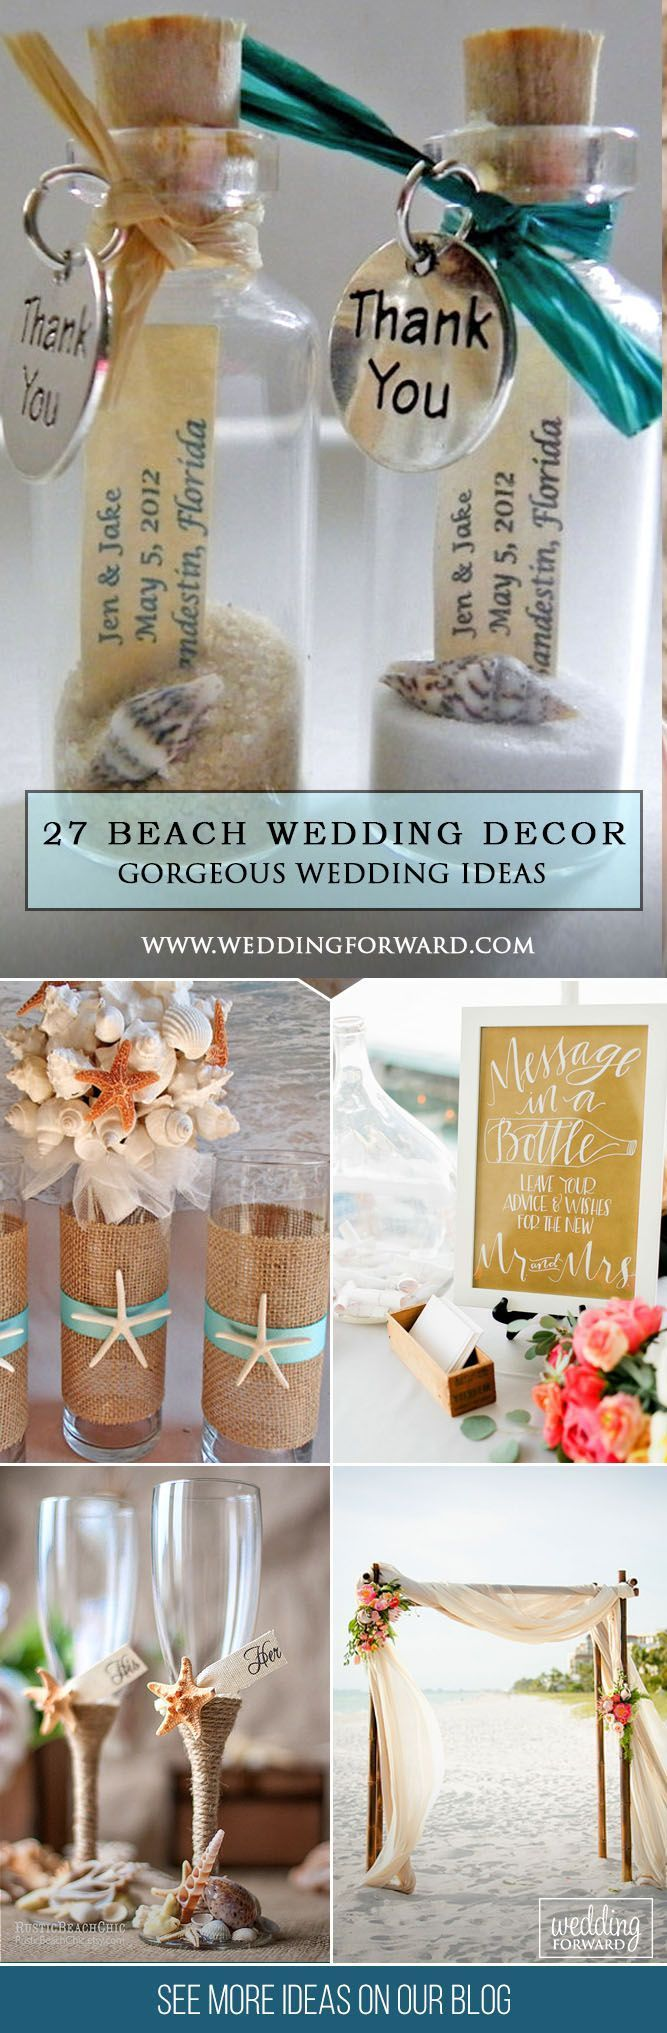 Beach wedding decoration ideas  Gorgeous Beach Wedding Decoration Ideas  Beach weddings donut